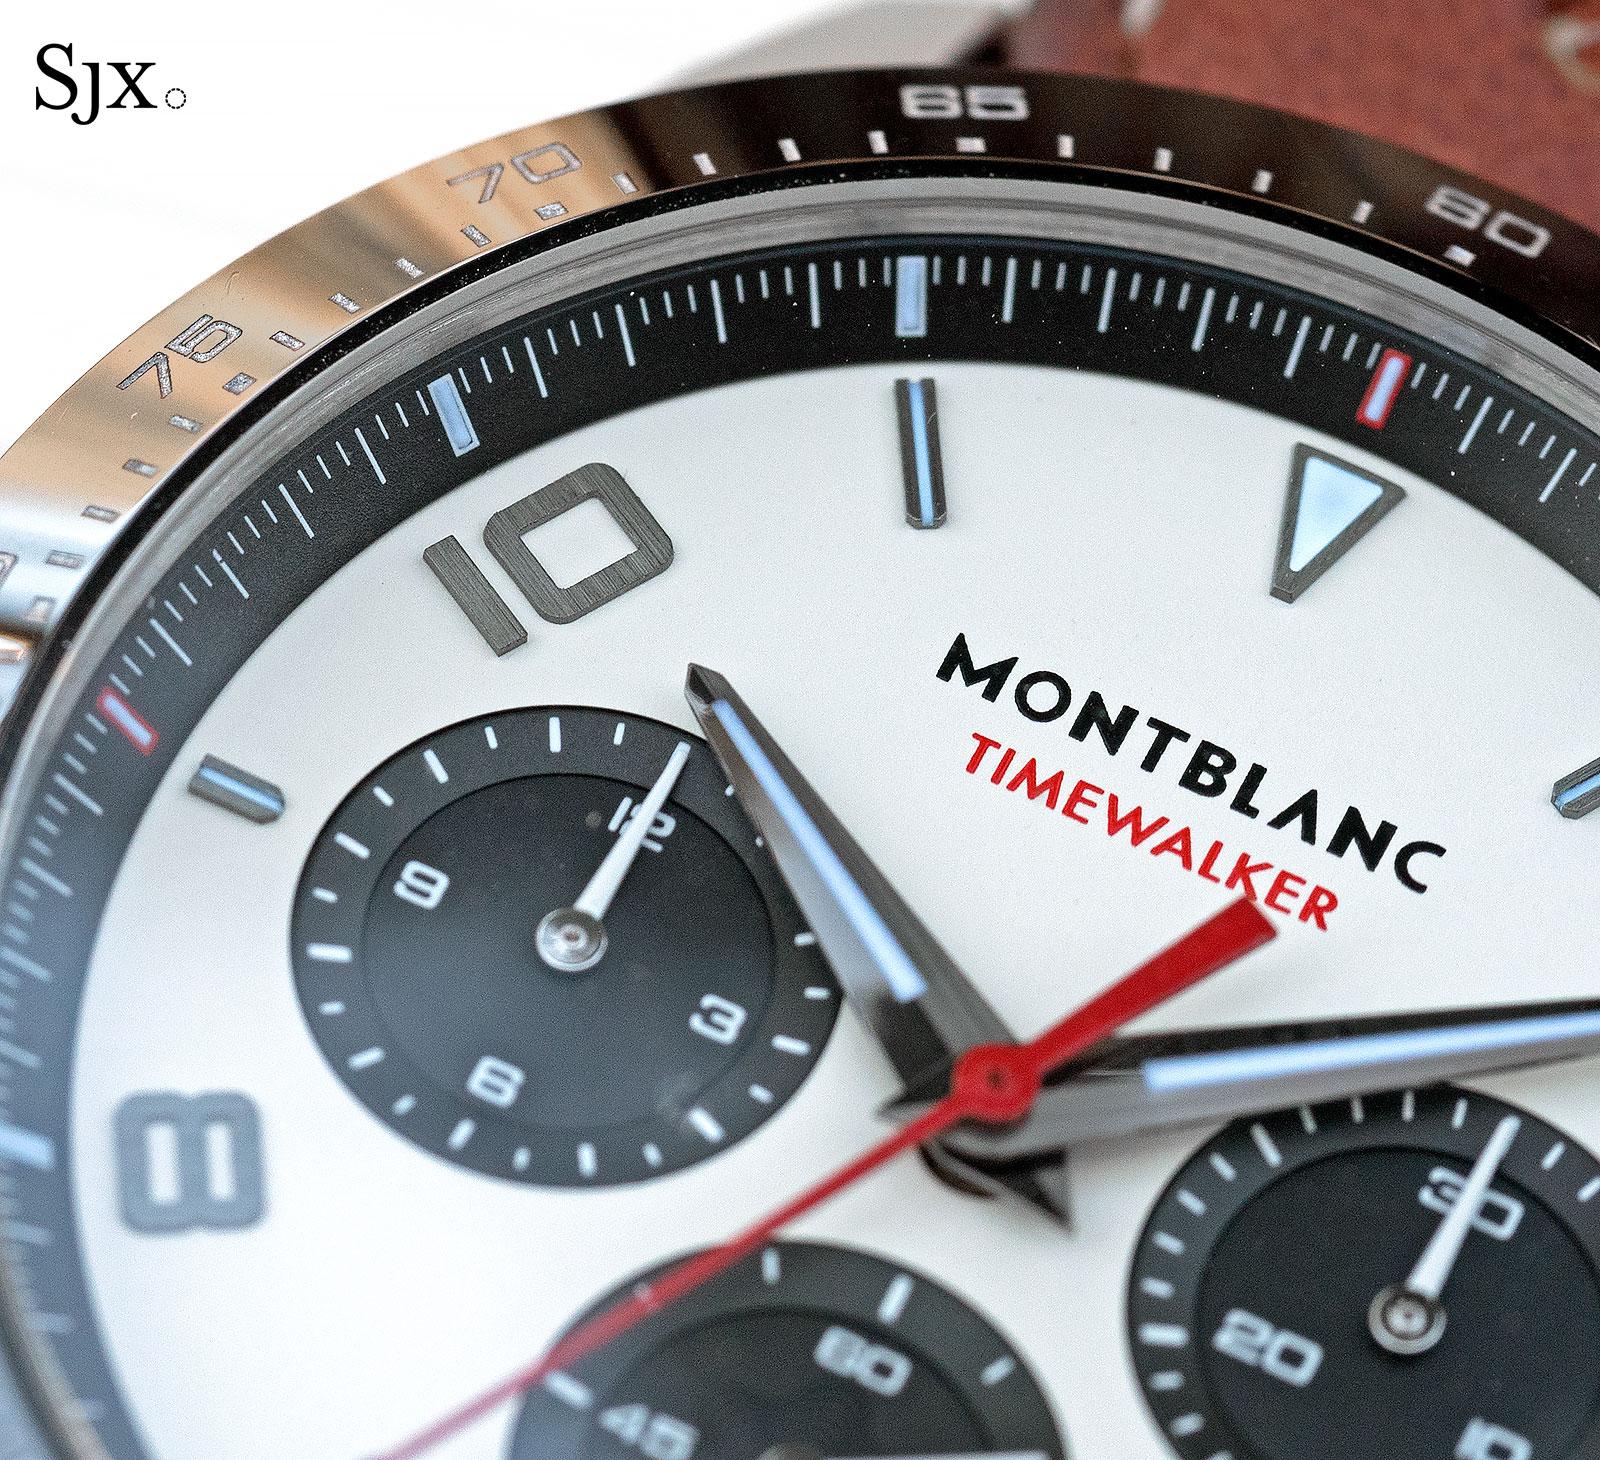 Montblanc Montblanc TimeWalker Manufacture Chronograph 7